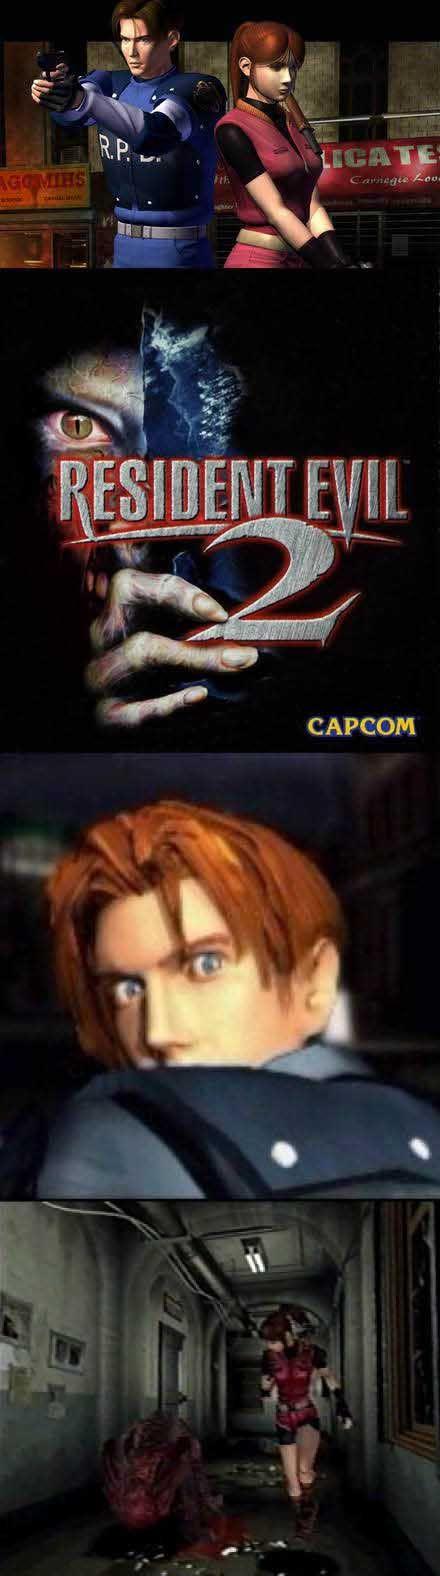 #GamerNews #ResidentEvil 2 HD will not just be a Remastered Game http://www.levelgamingground.com/resident-evil-2-remake.html